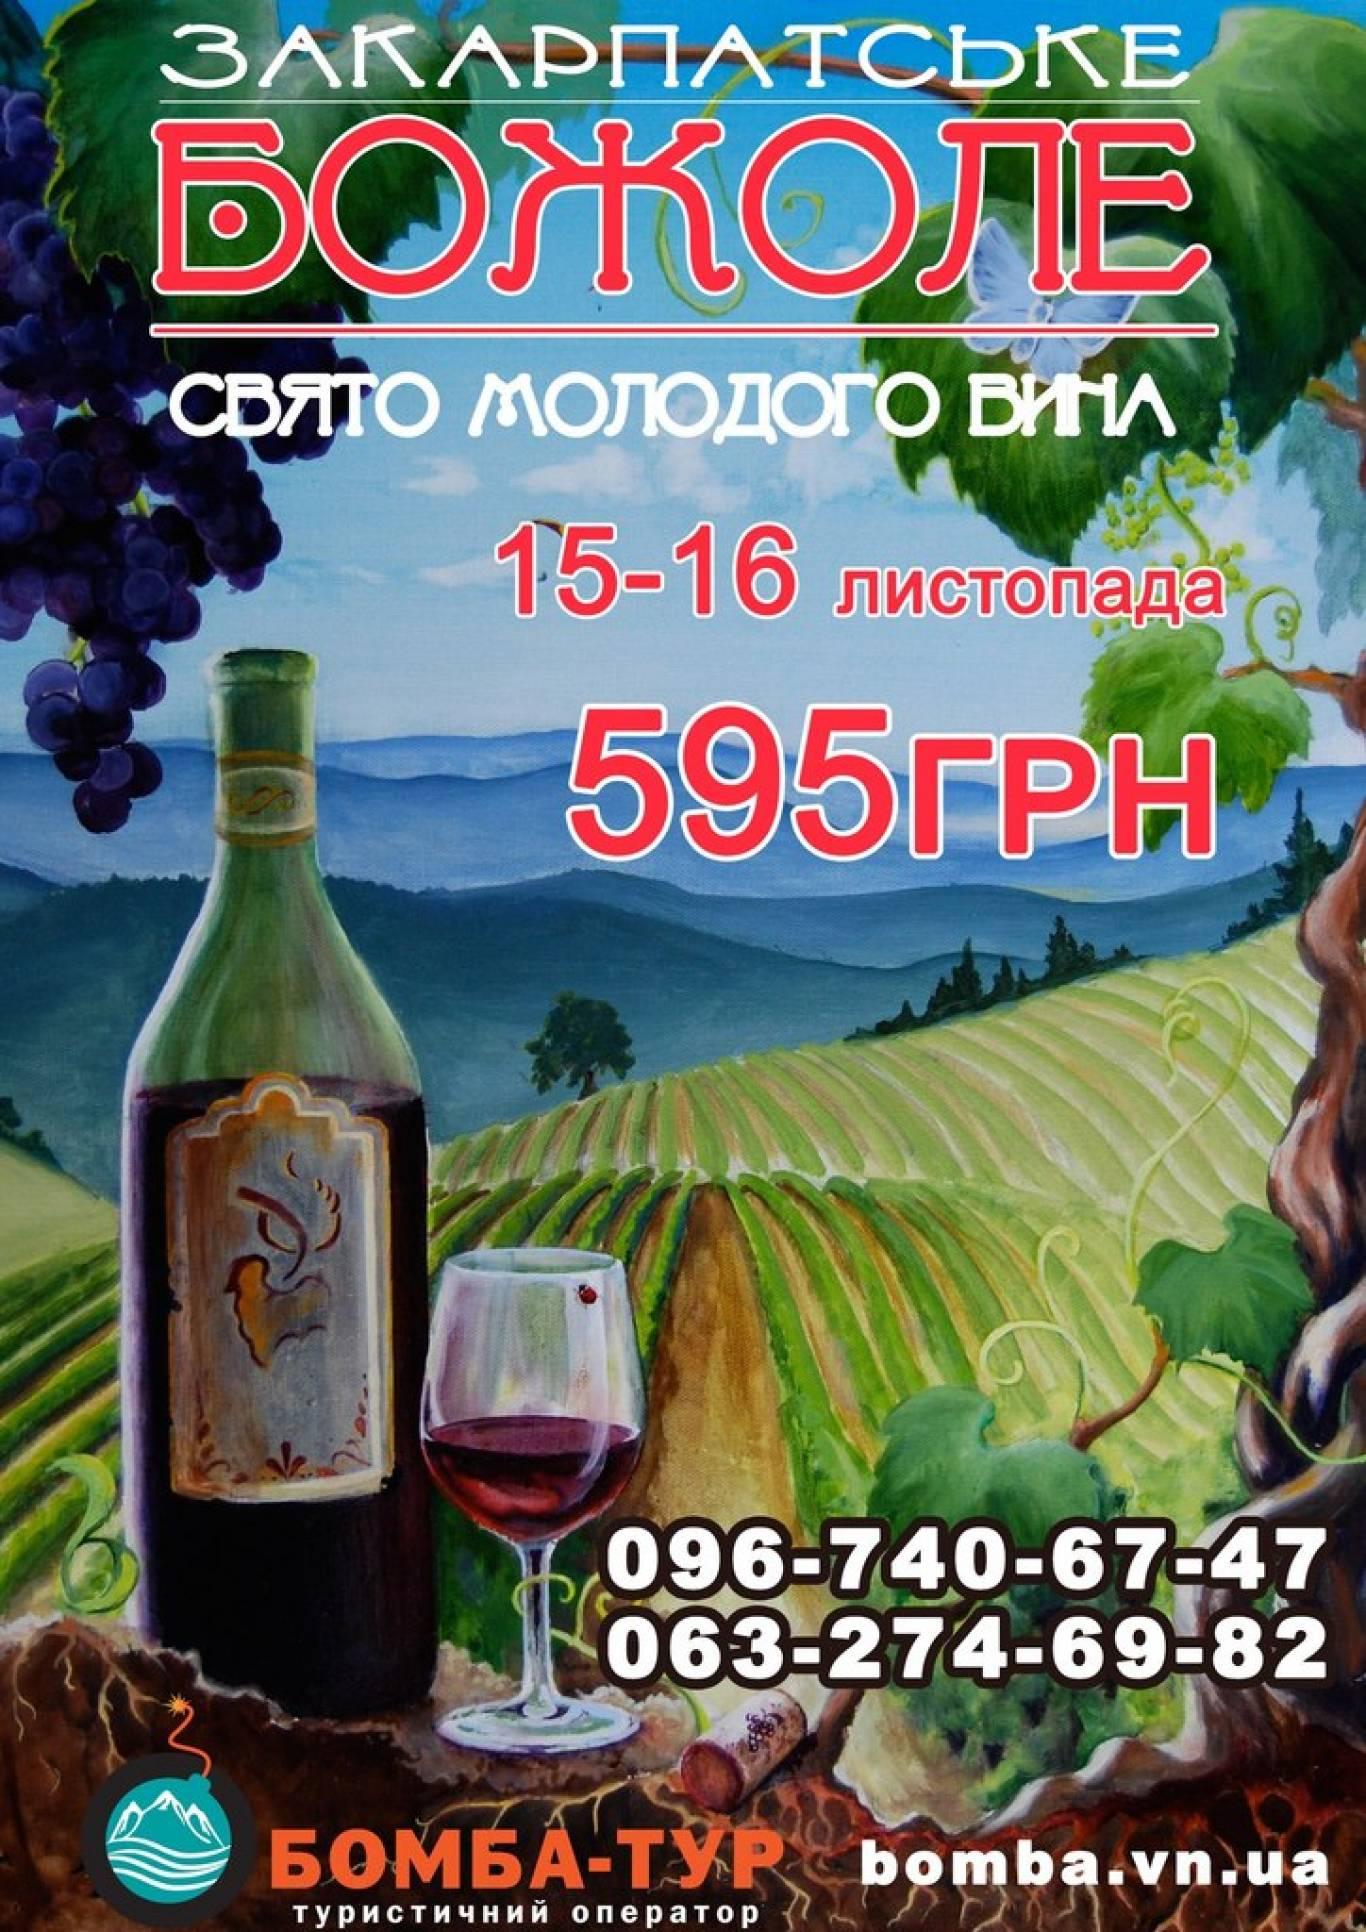 "Поїздка на фестиваль молодого вина ""Божоле 2014""."